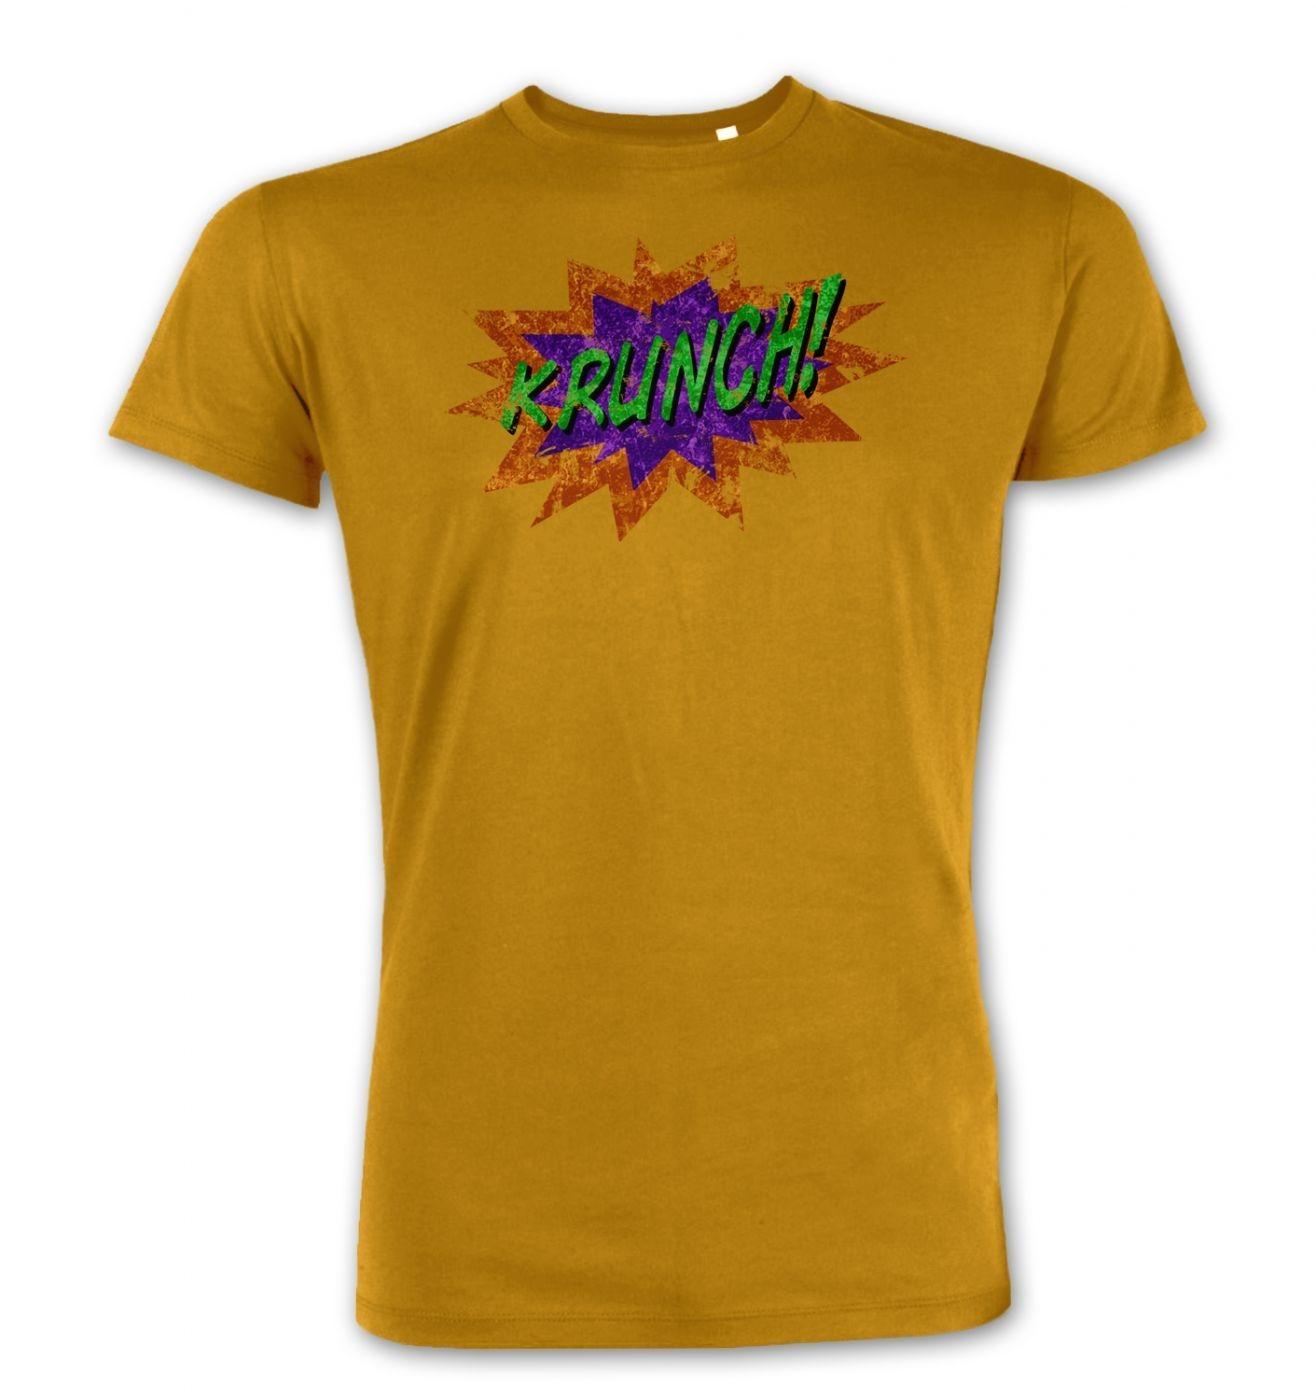 Krunch men's Premium t-shirt